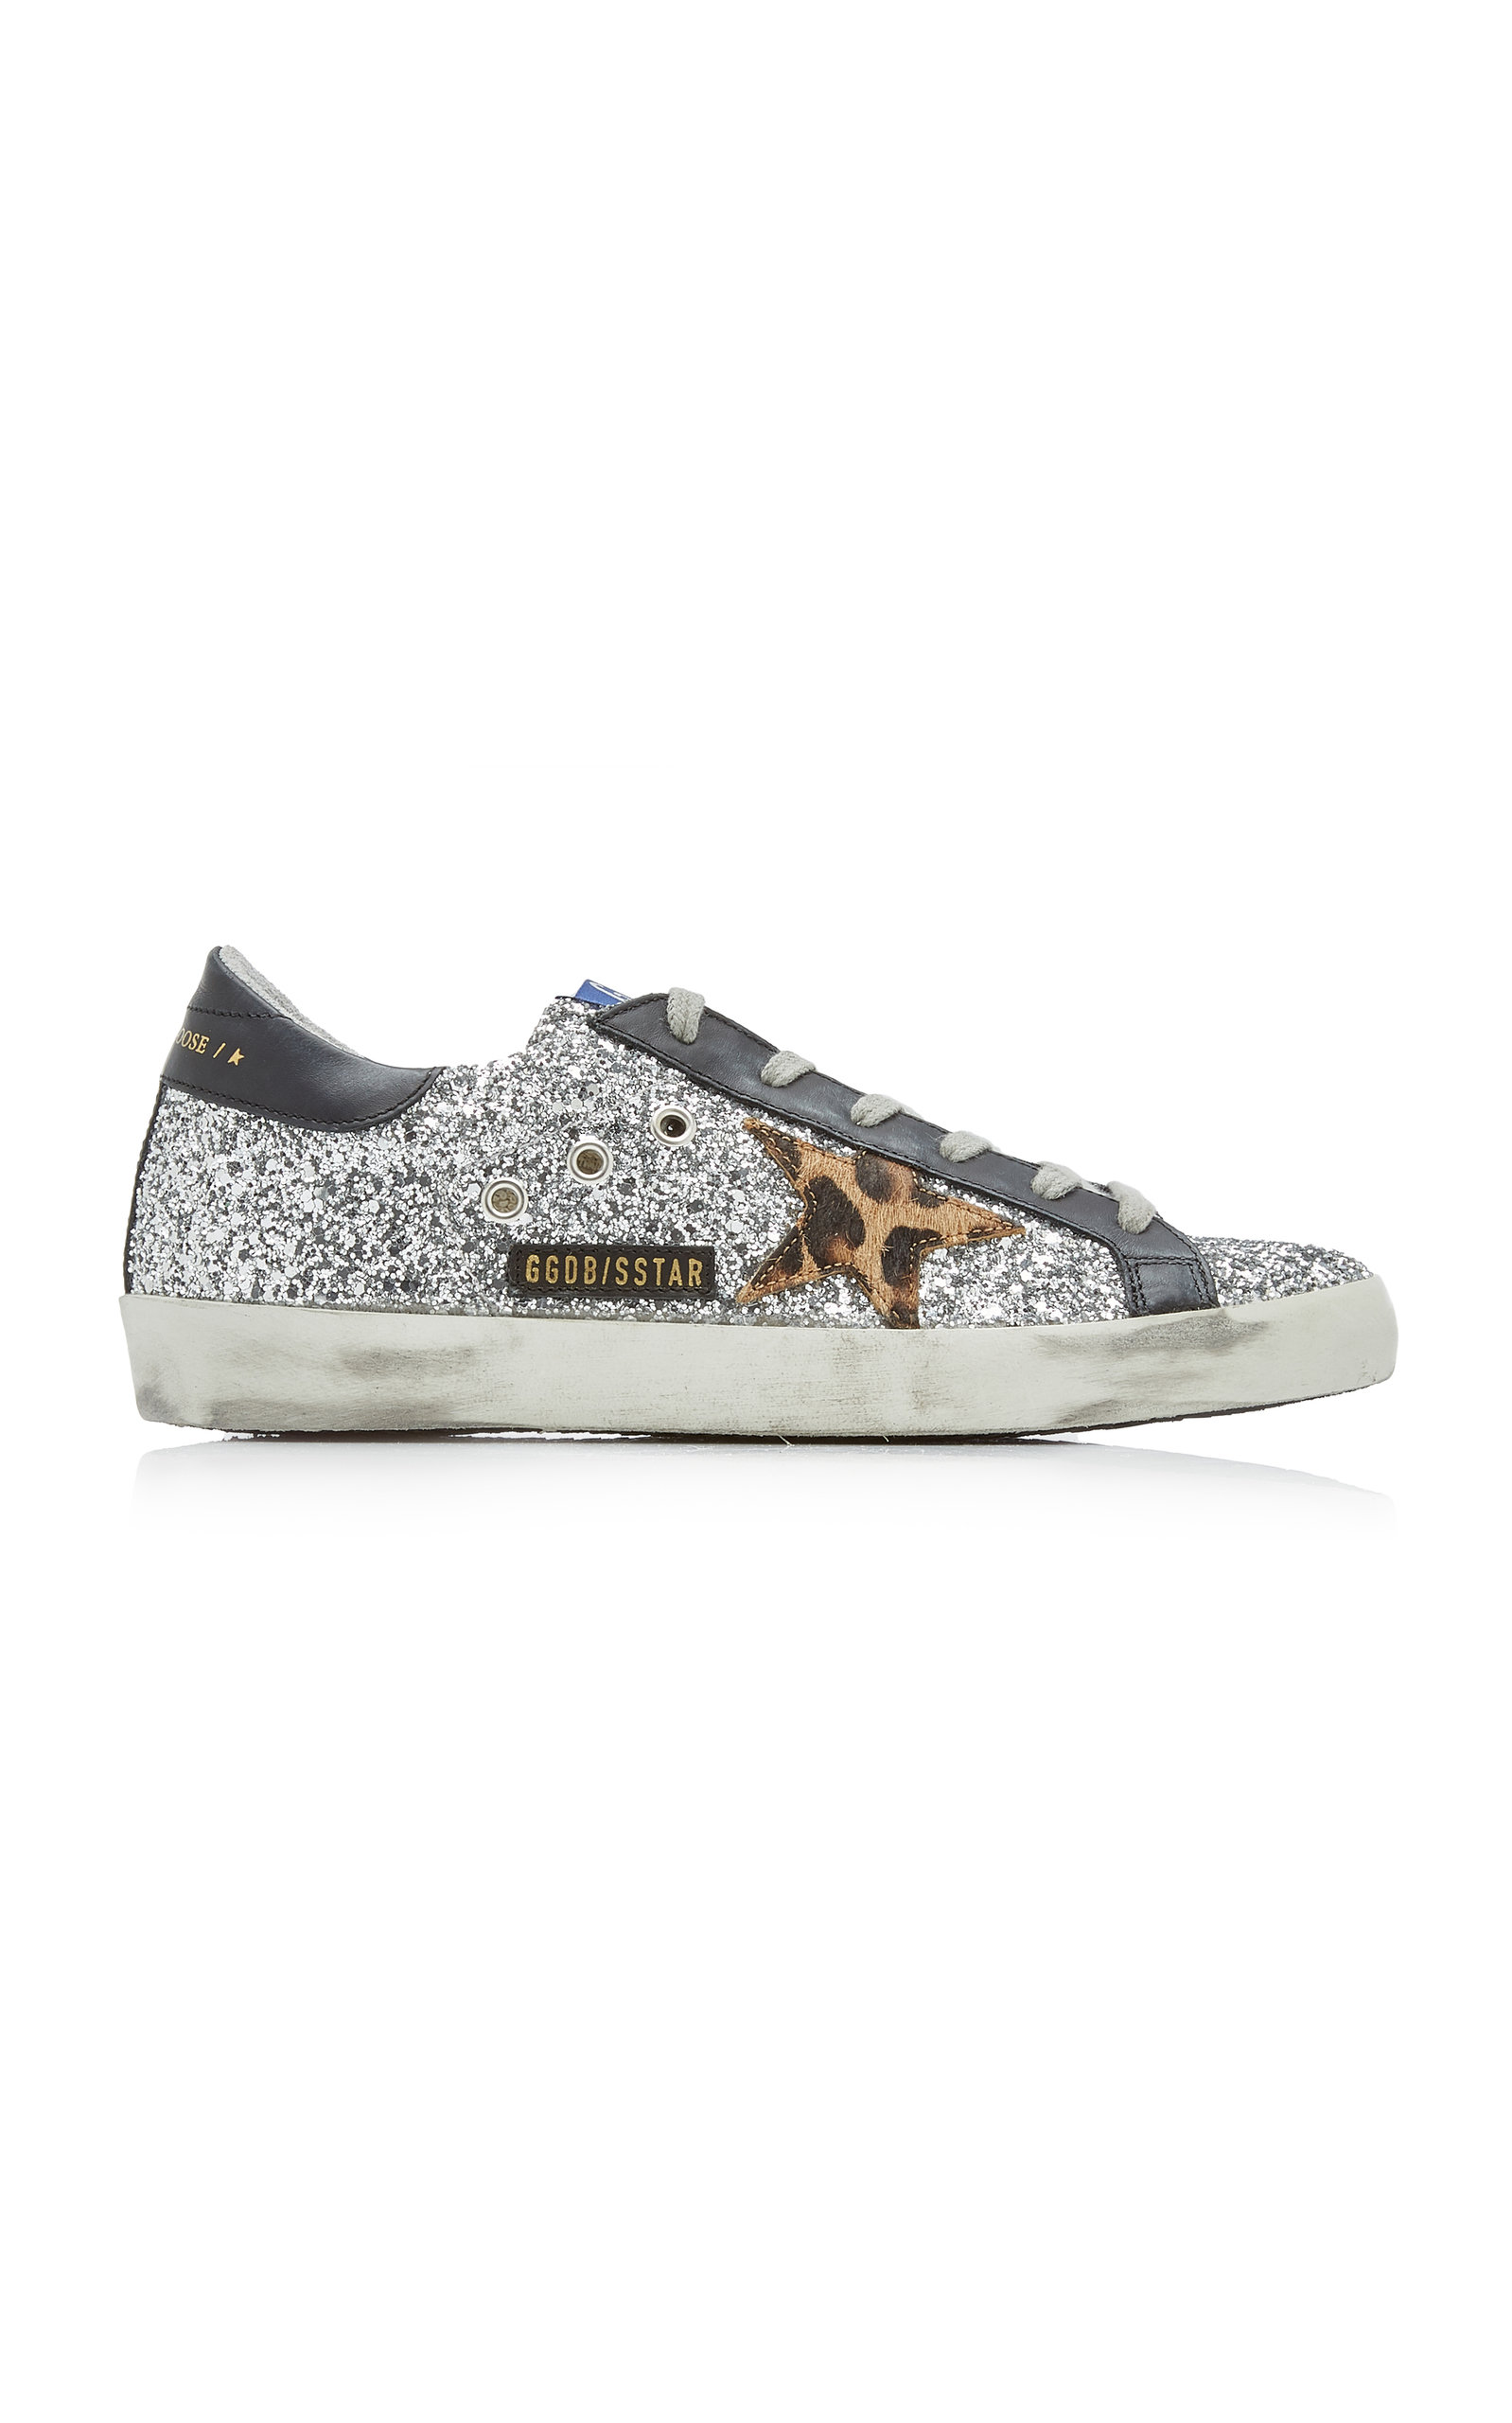 Golden Goose - Women's Superstar Glitter Leather Sneakers  - Silver - Moda Operandi